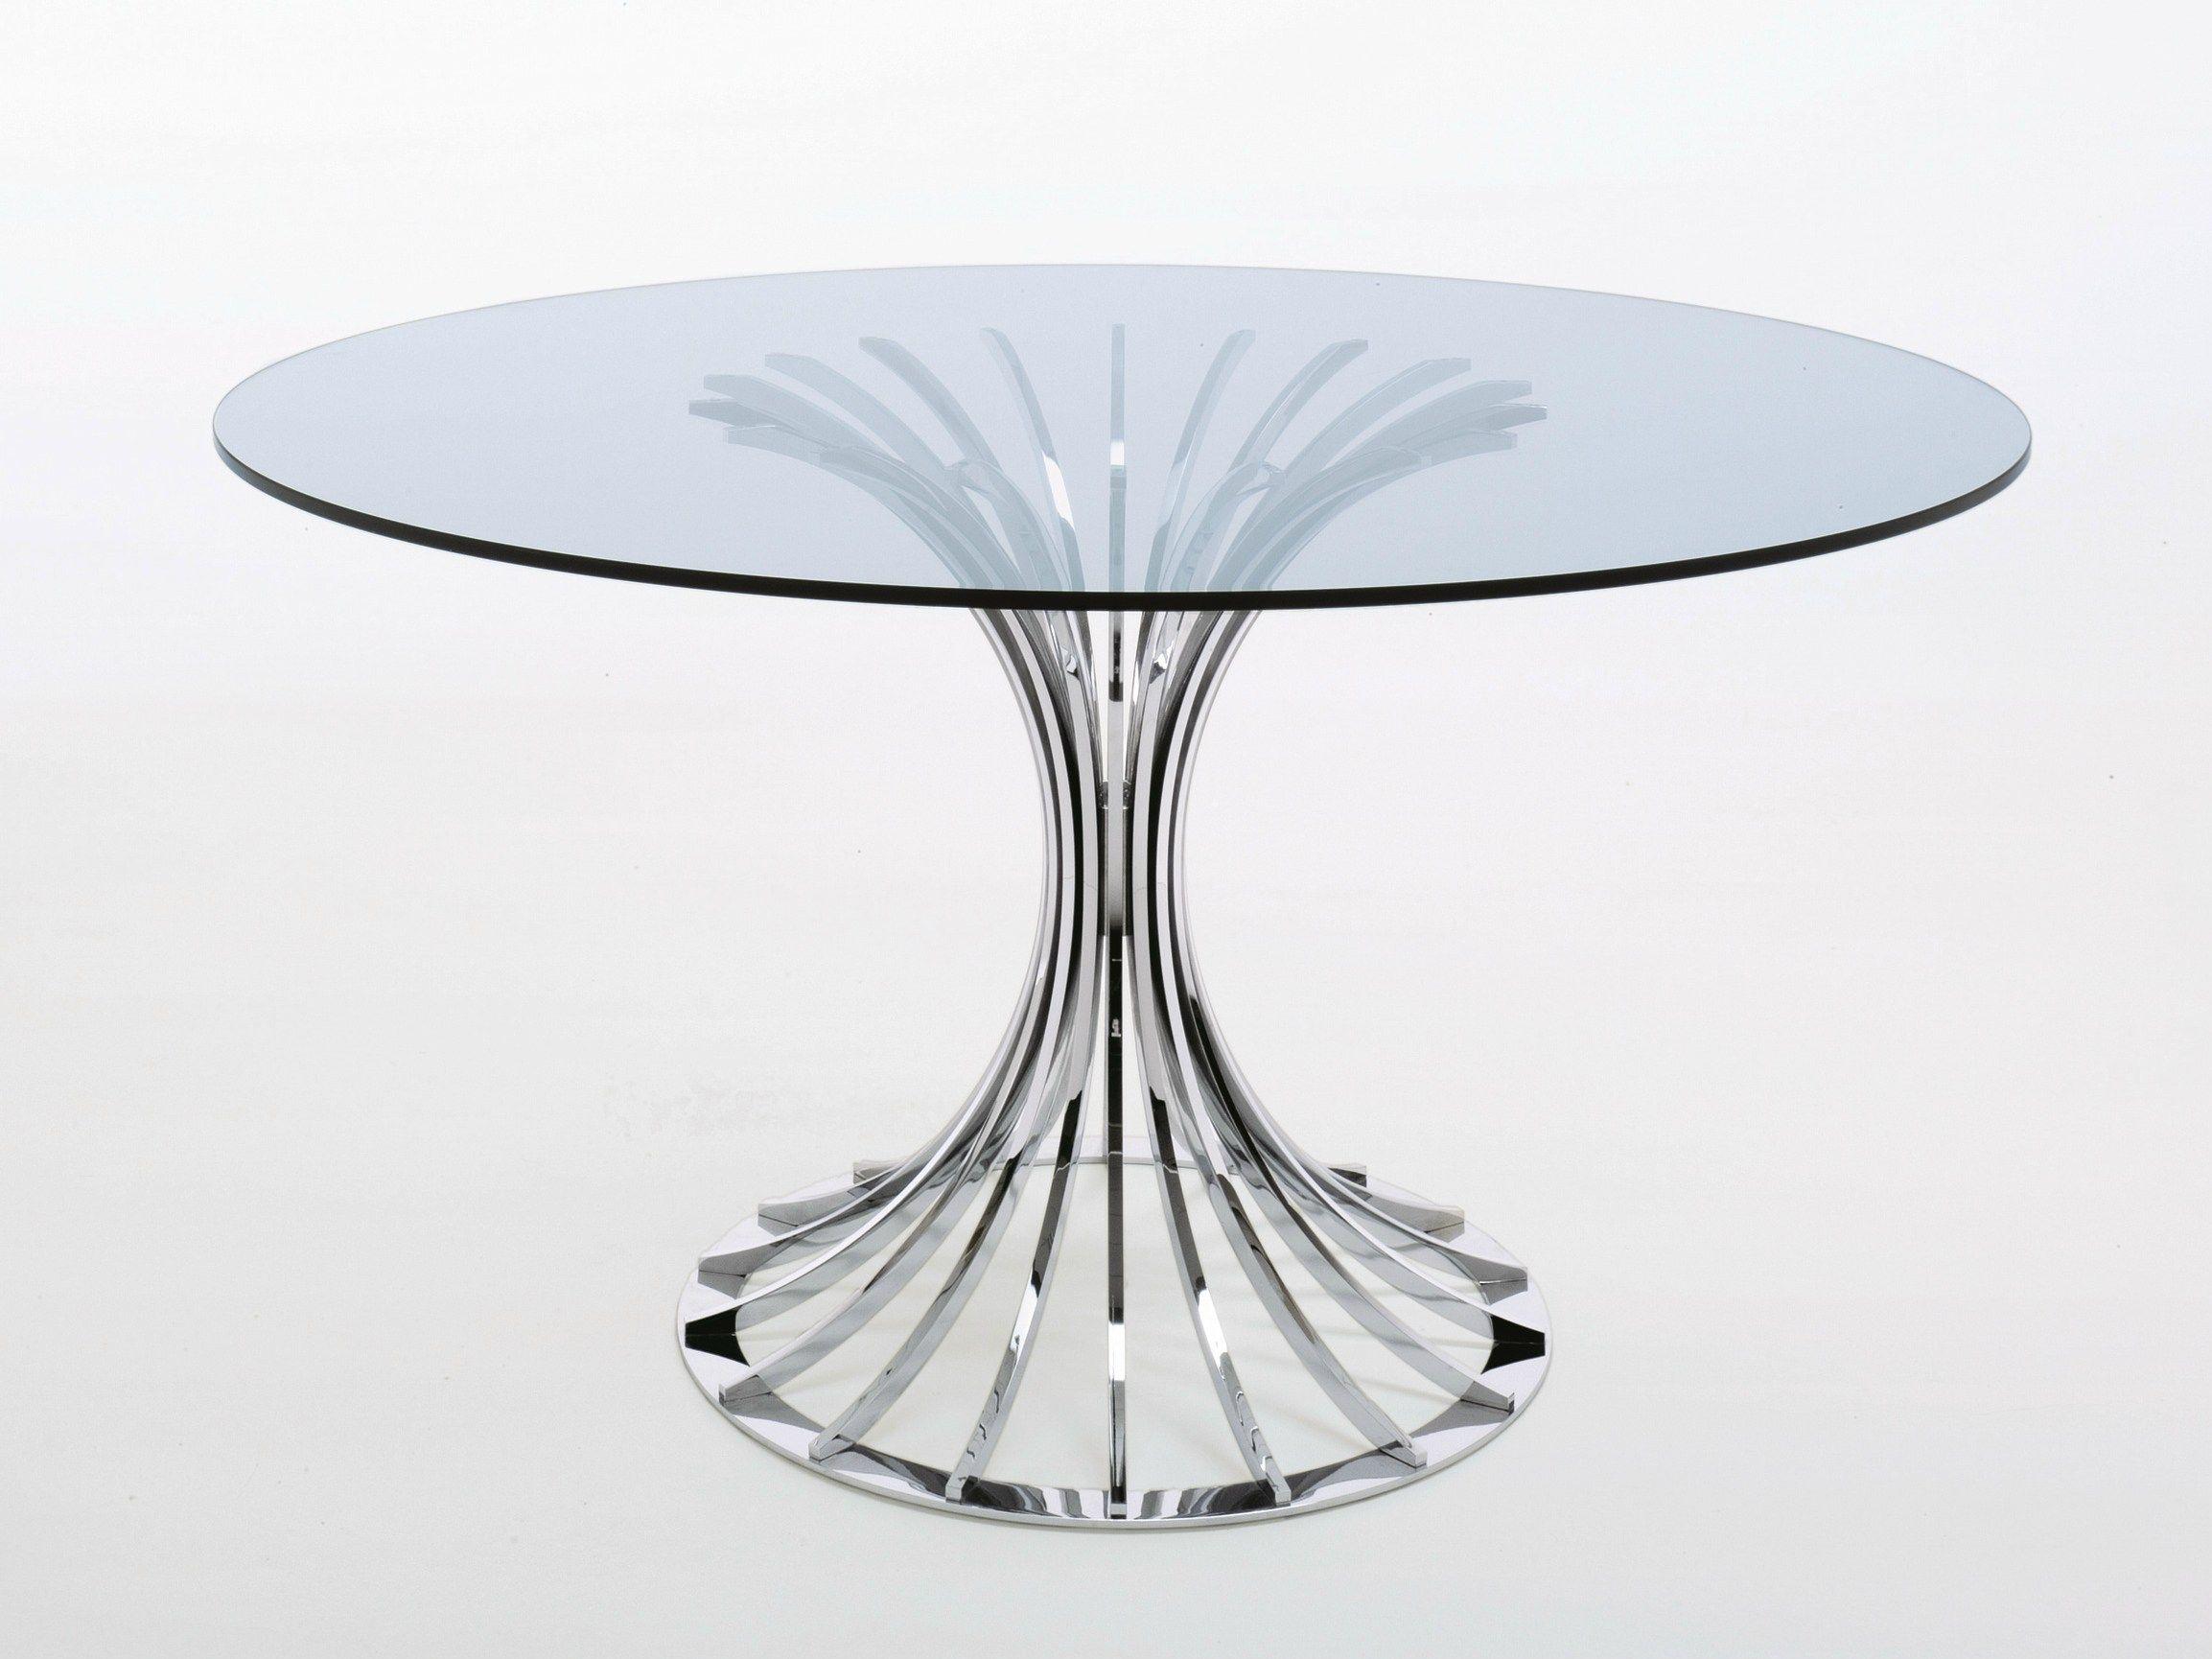 Mesa redonda de cristal bellafonte by misuraemme dise o - Mesas redondas cristal ...